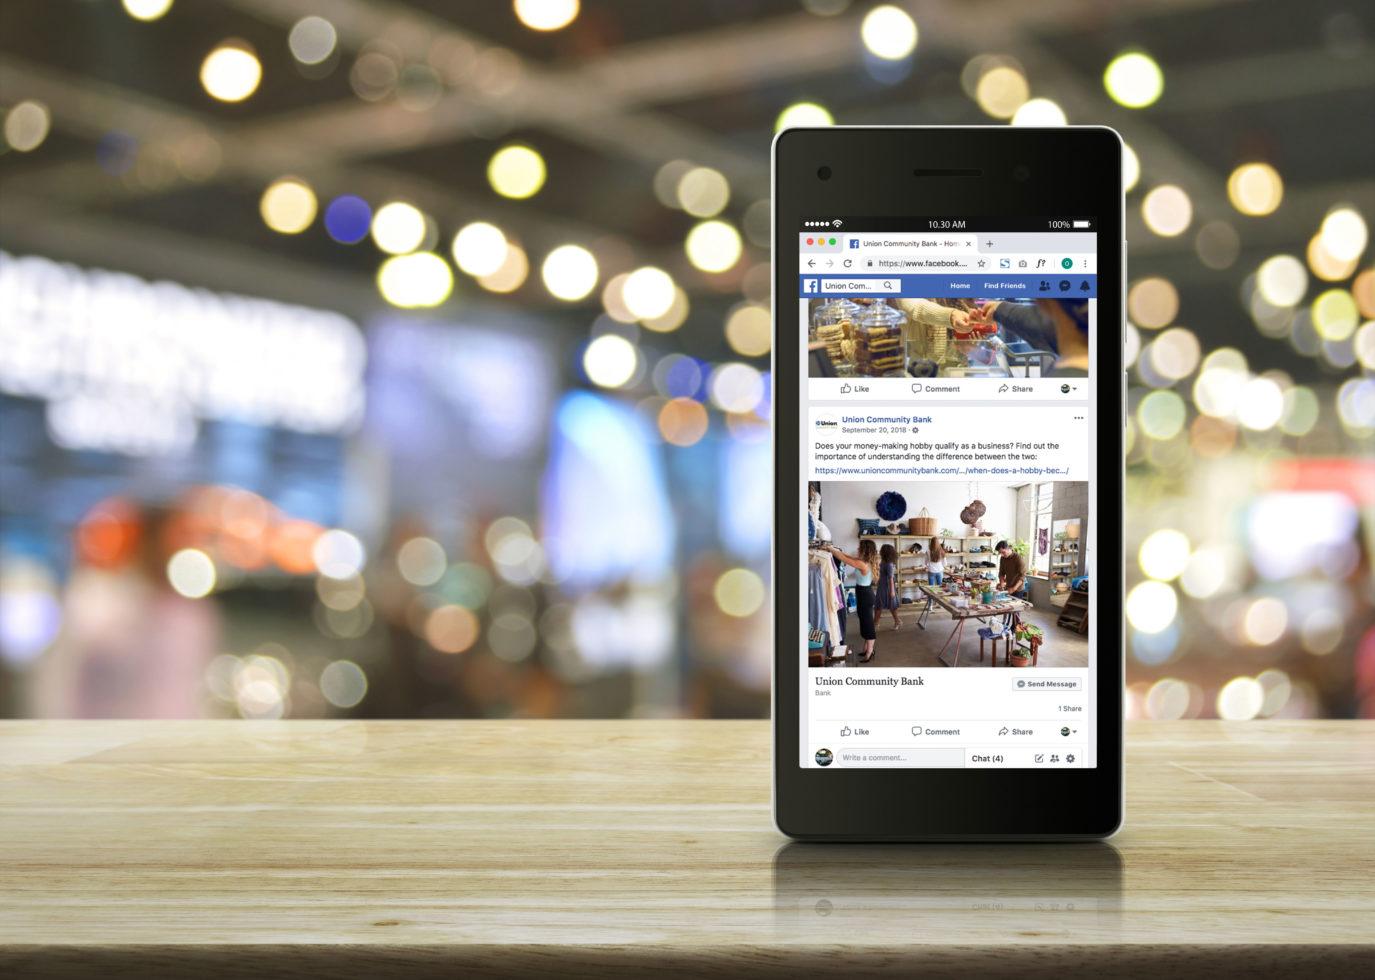 UCB Social Media & Digital Campaign by Synapse